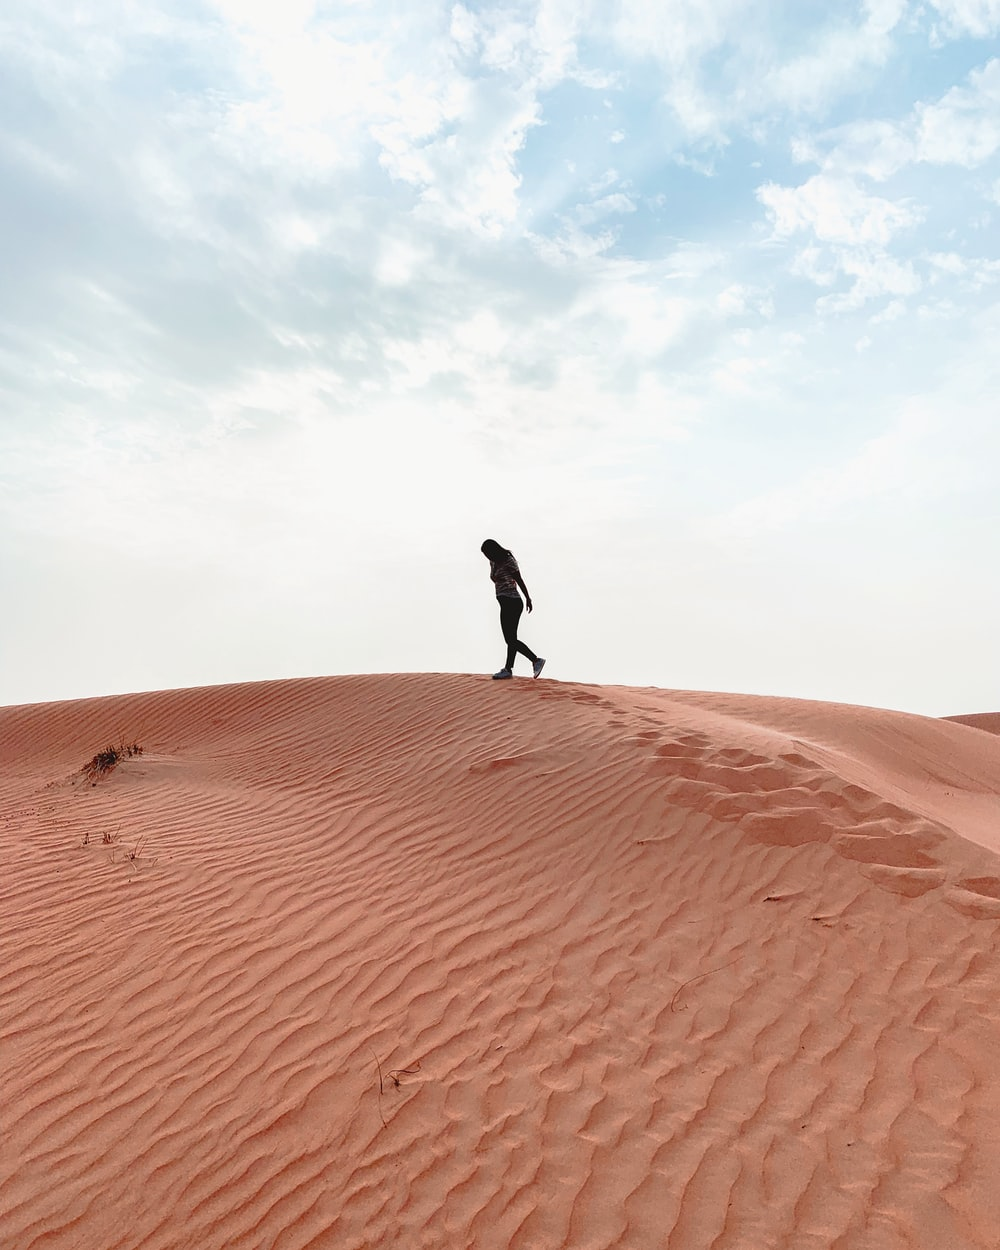 silhouette of woman walking on desert